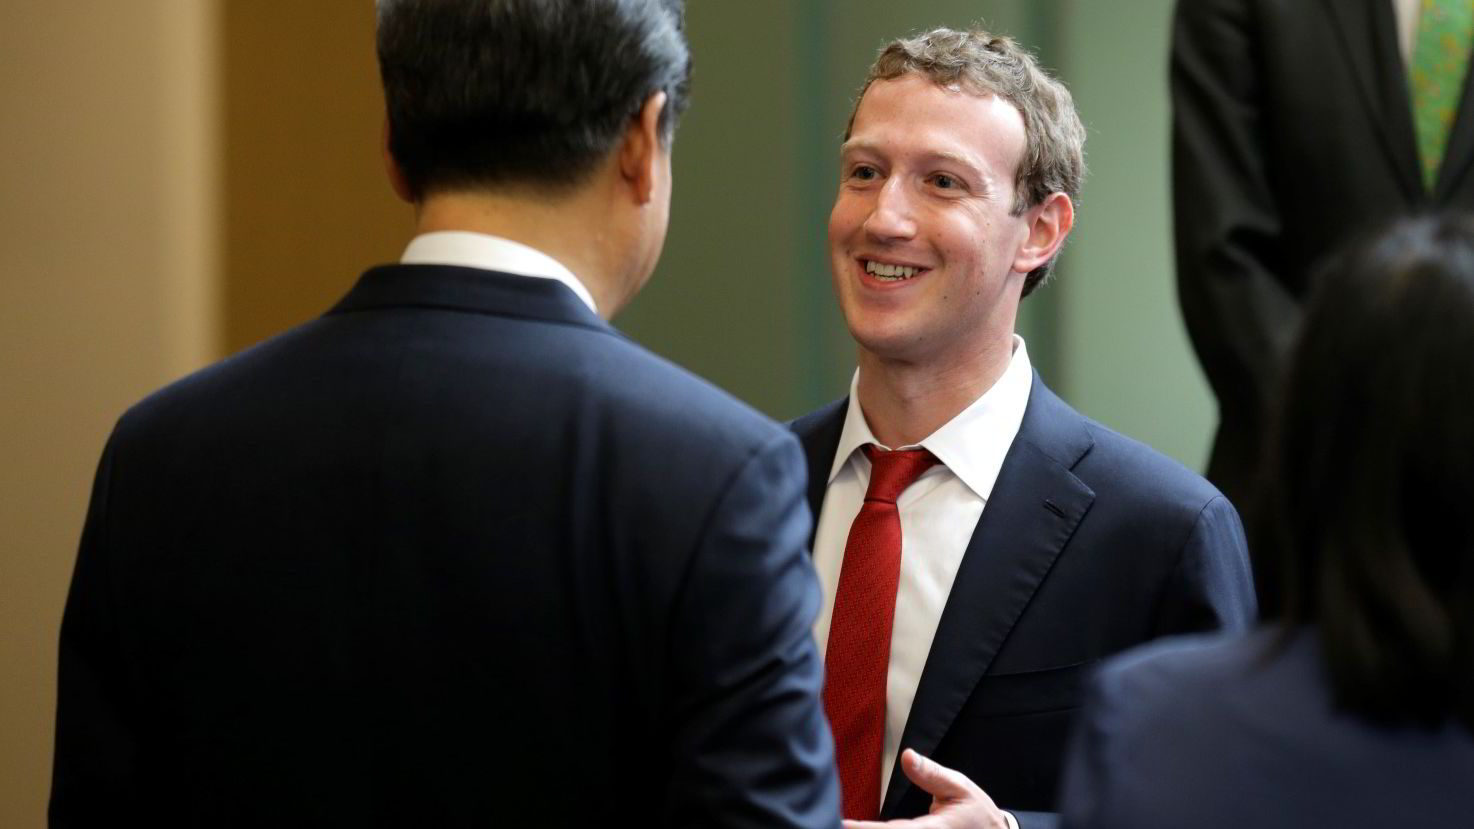 Kinas president Xi Jinping (til venstre) snakker med Facebook-gründer Mark Zuckerberg i USA onsdag kveld. Zuckerberg overrasket med å føre samtalen på mandarin. Foto: Ted S. Warren/AP Photo/NTB scanpix